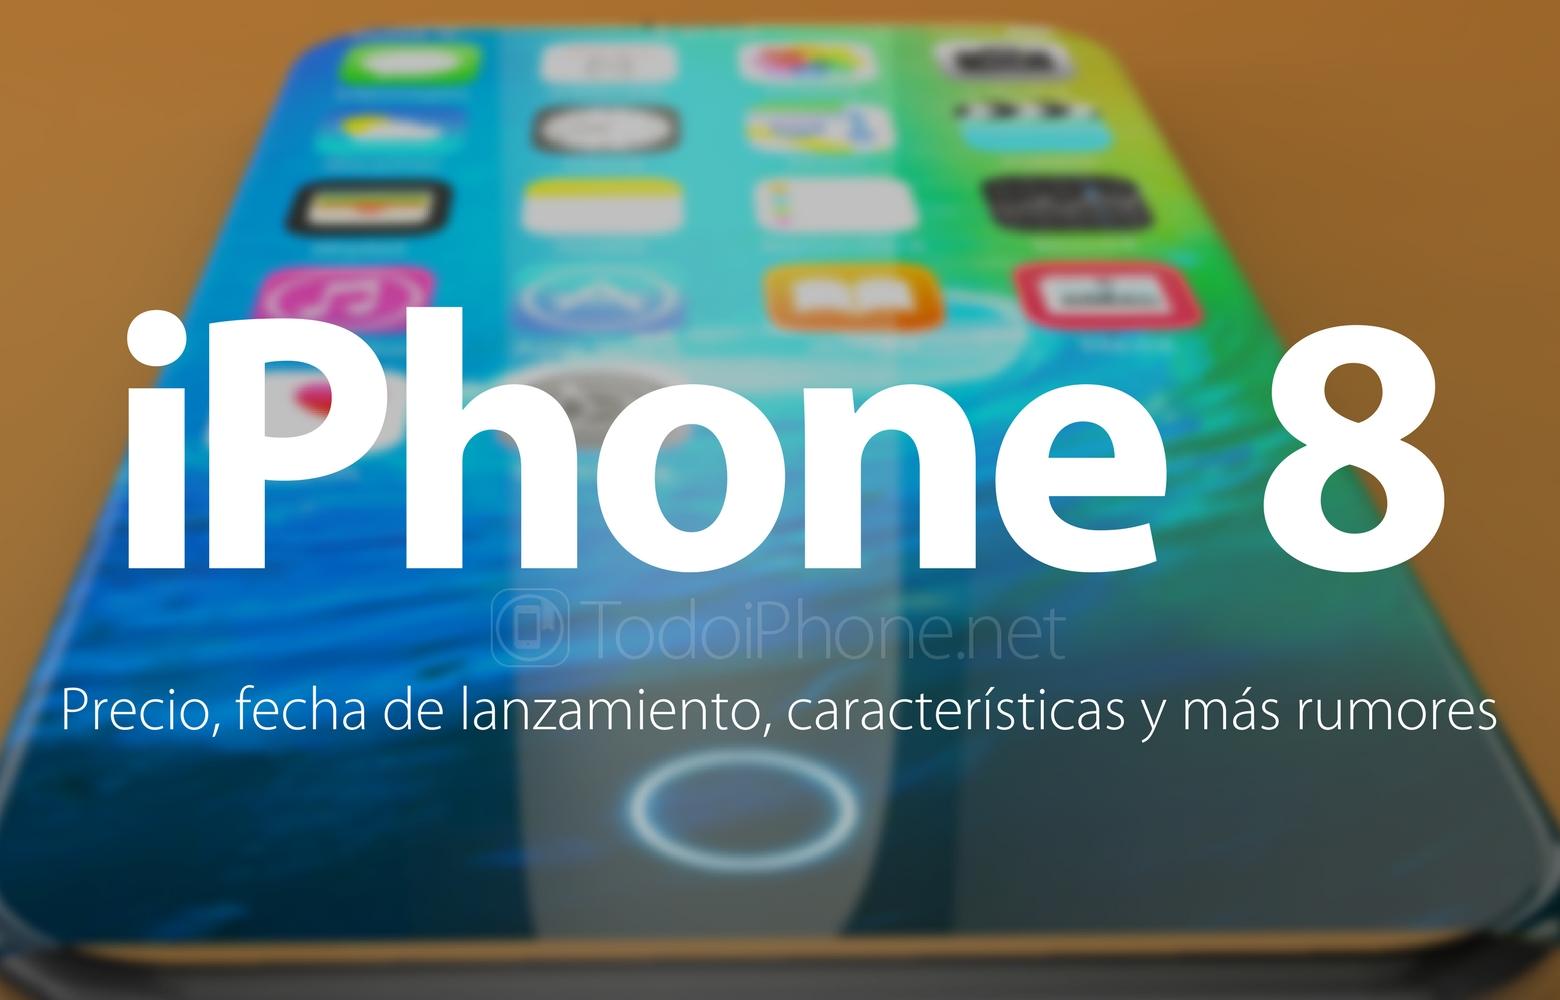 5 s iphone precio